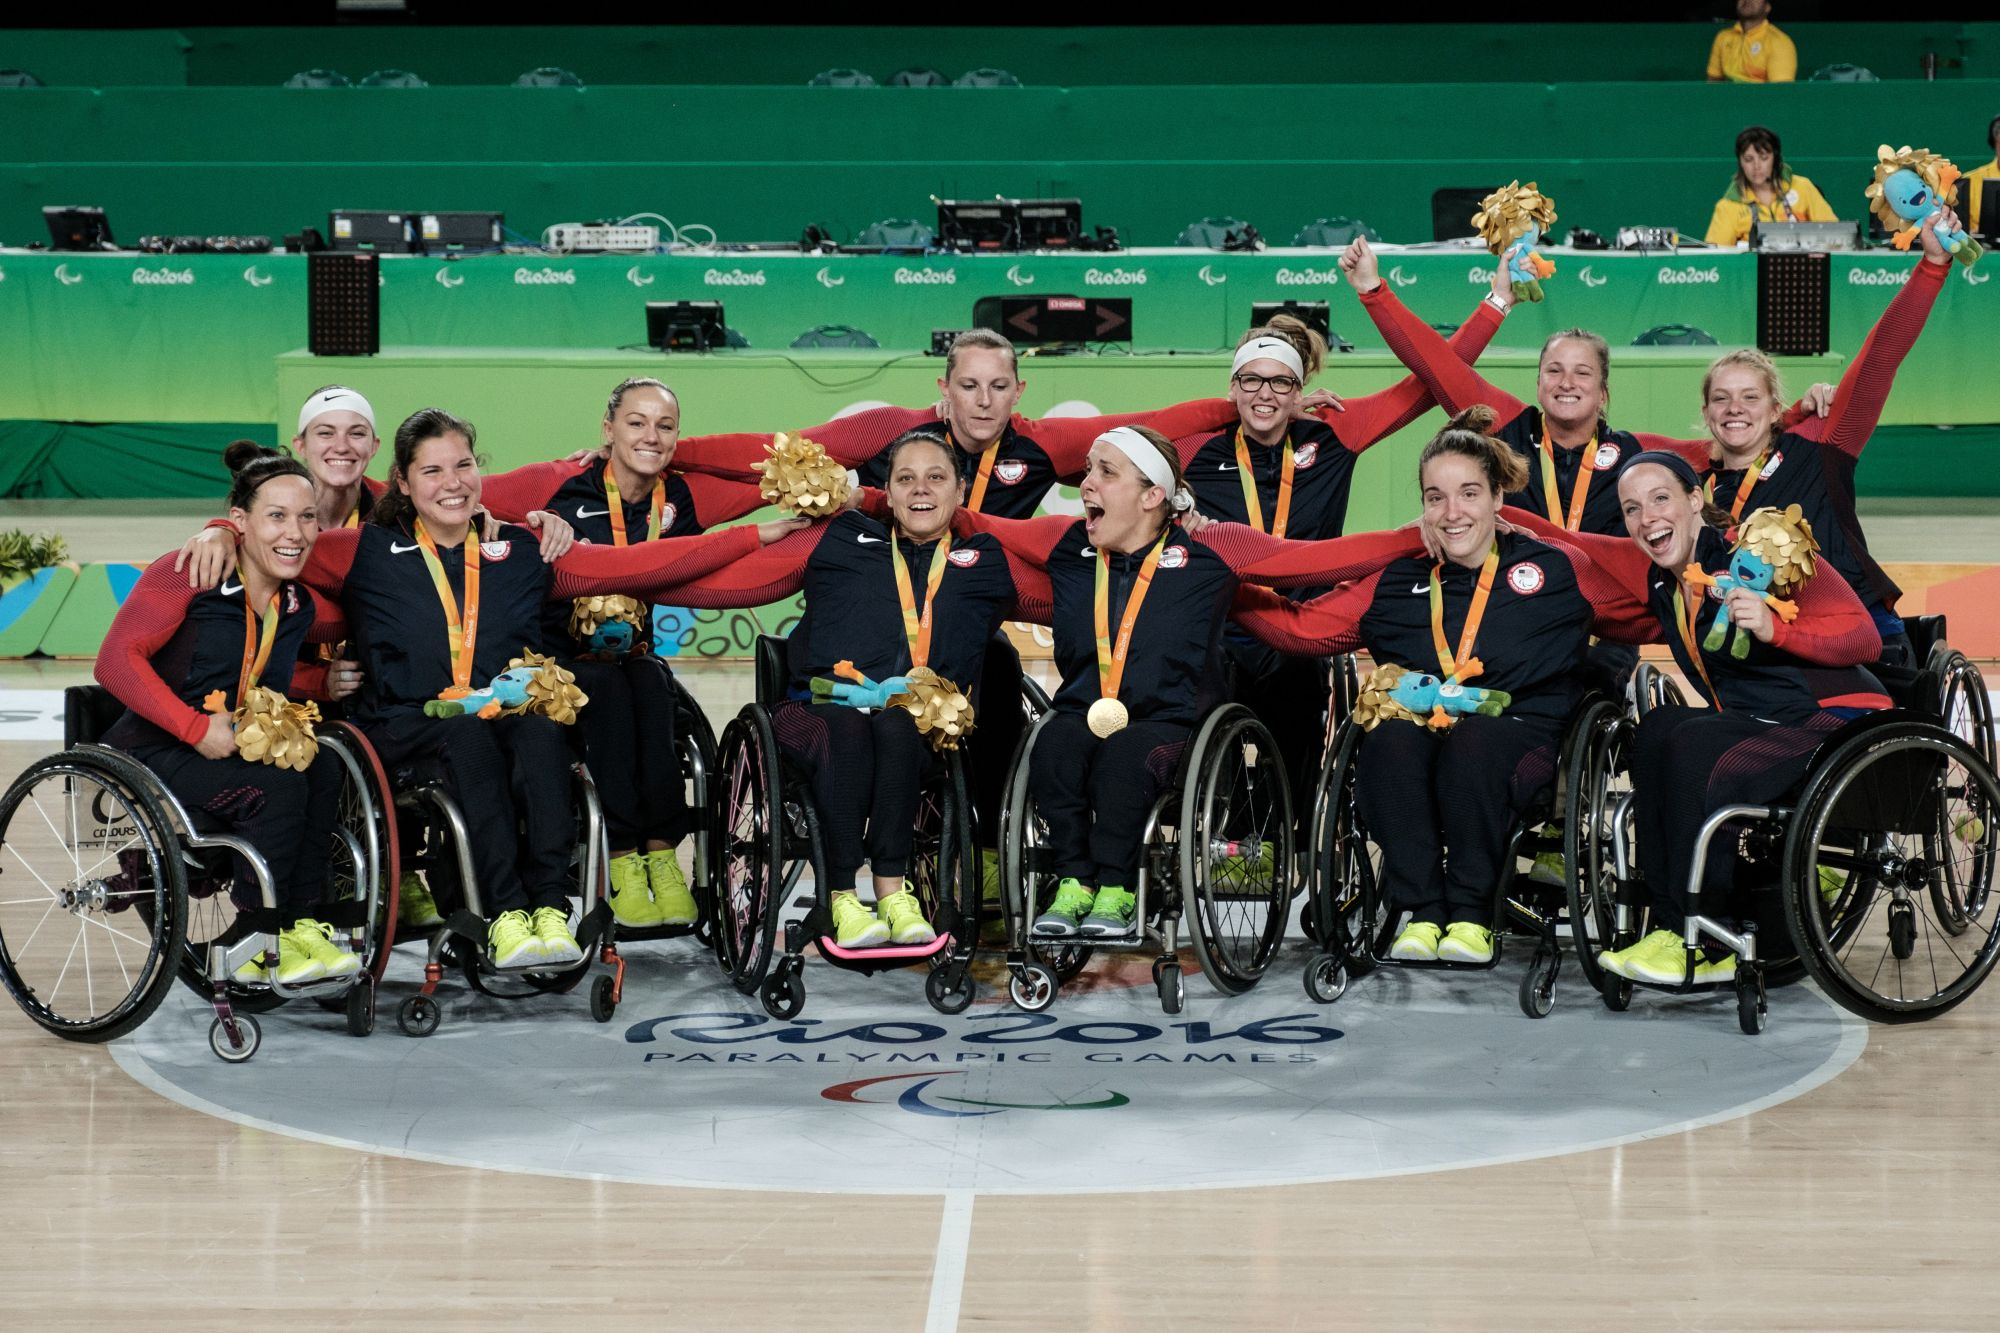 The U.S. gold medal team